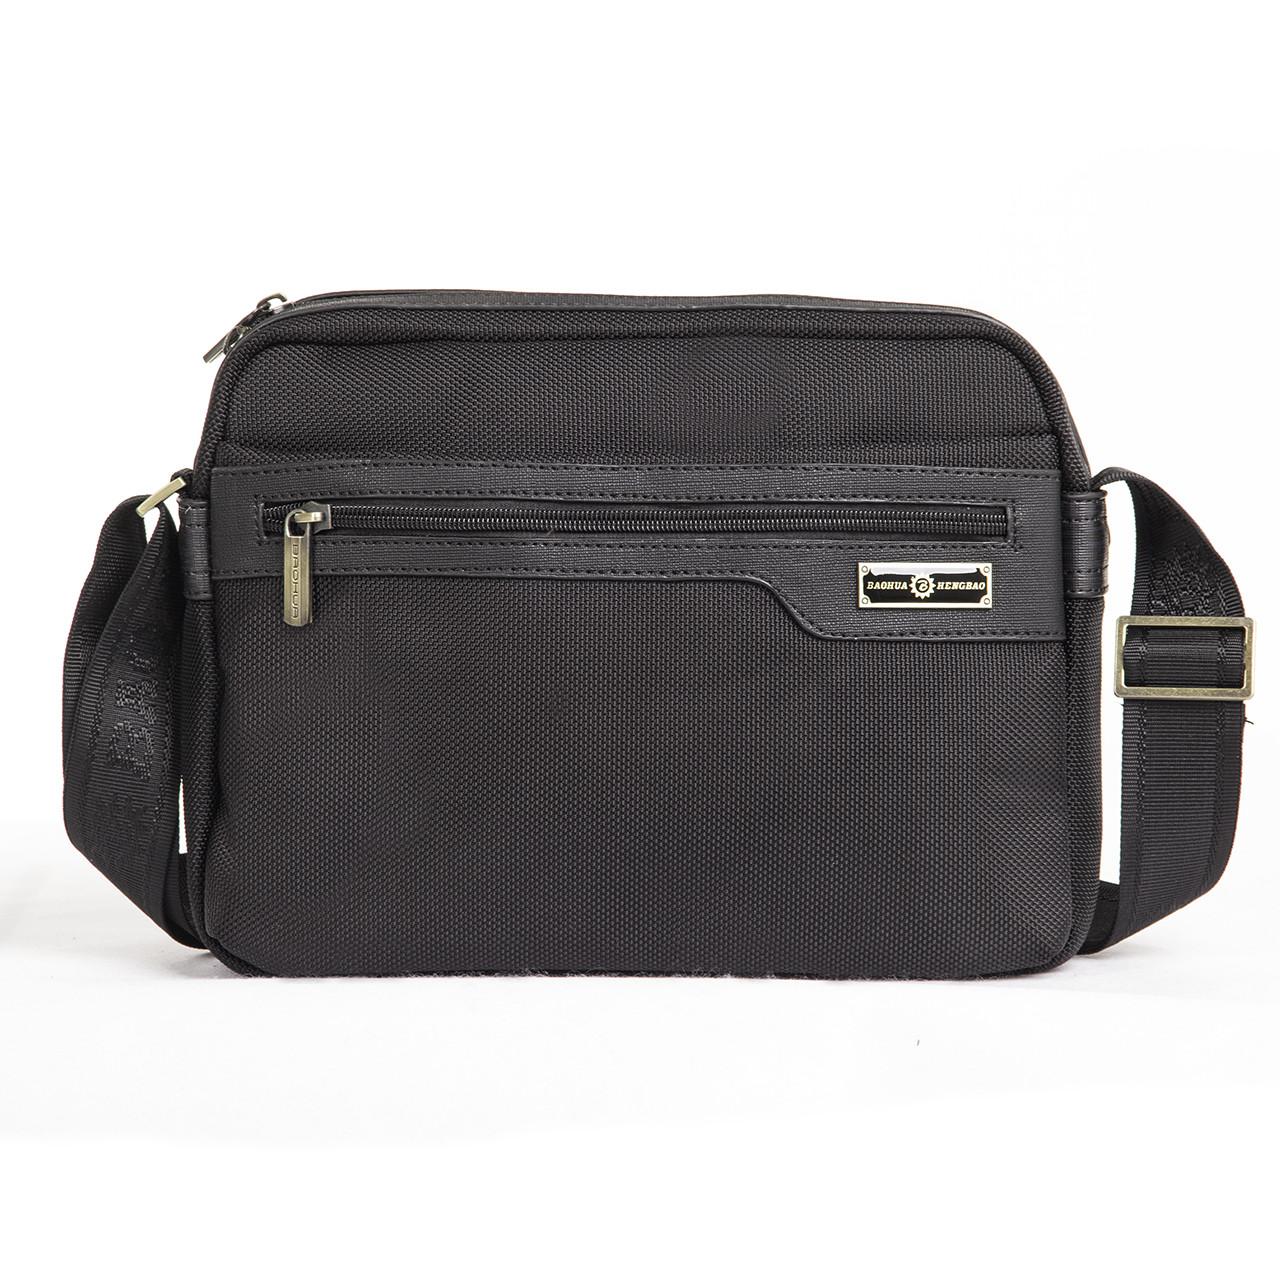 Мужская сумка BAOHUA чёрная 28х21х8 ткань Оксфорд горизонтальная ксВН8159-11,5ч